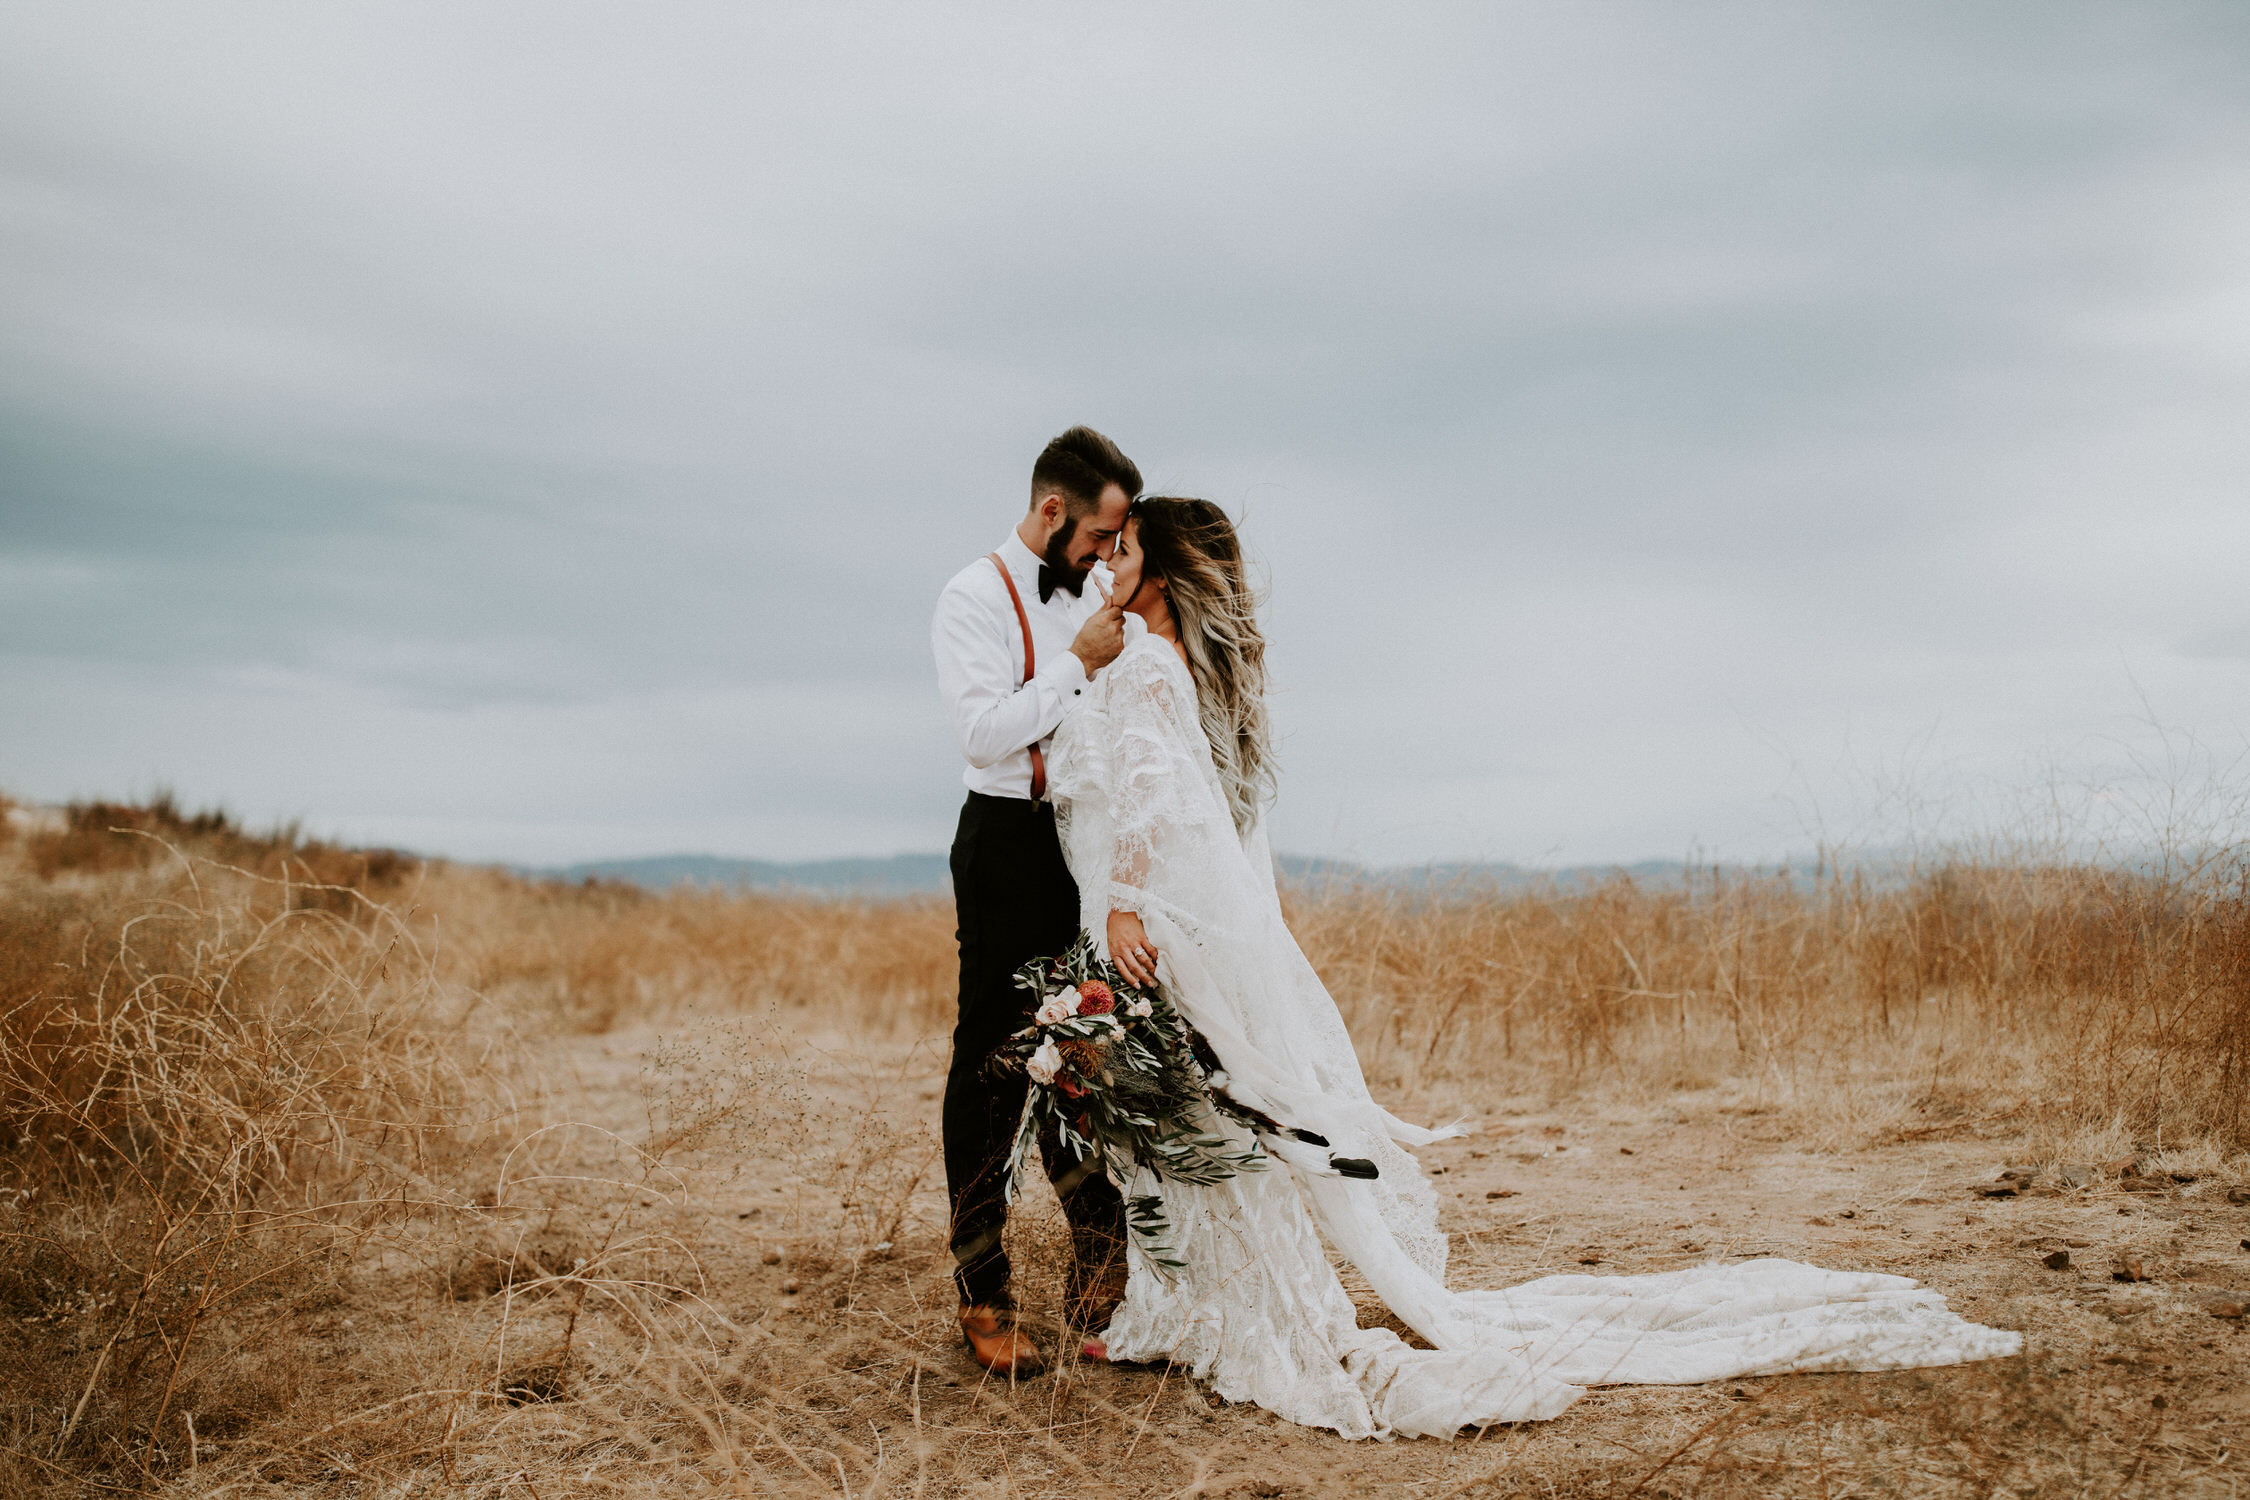 couple-intimate-wedding-temecula-767.jpg